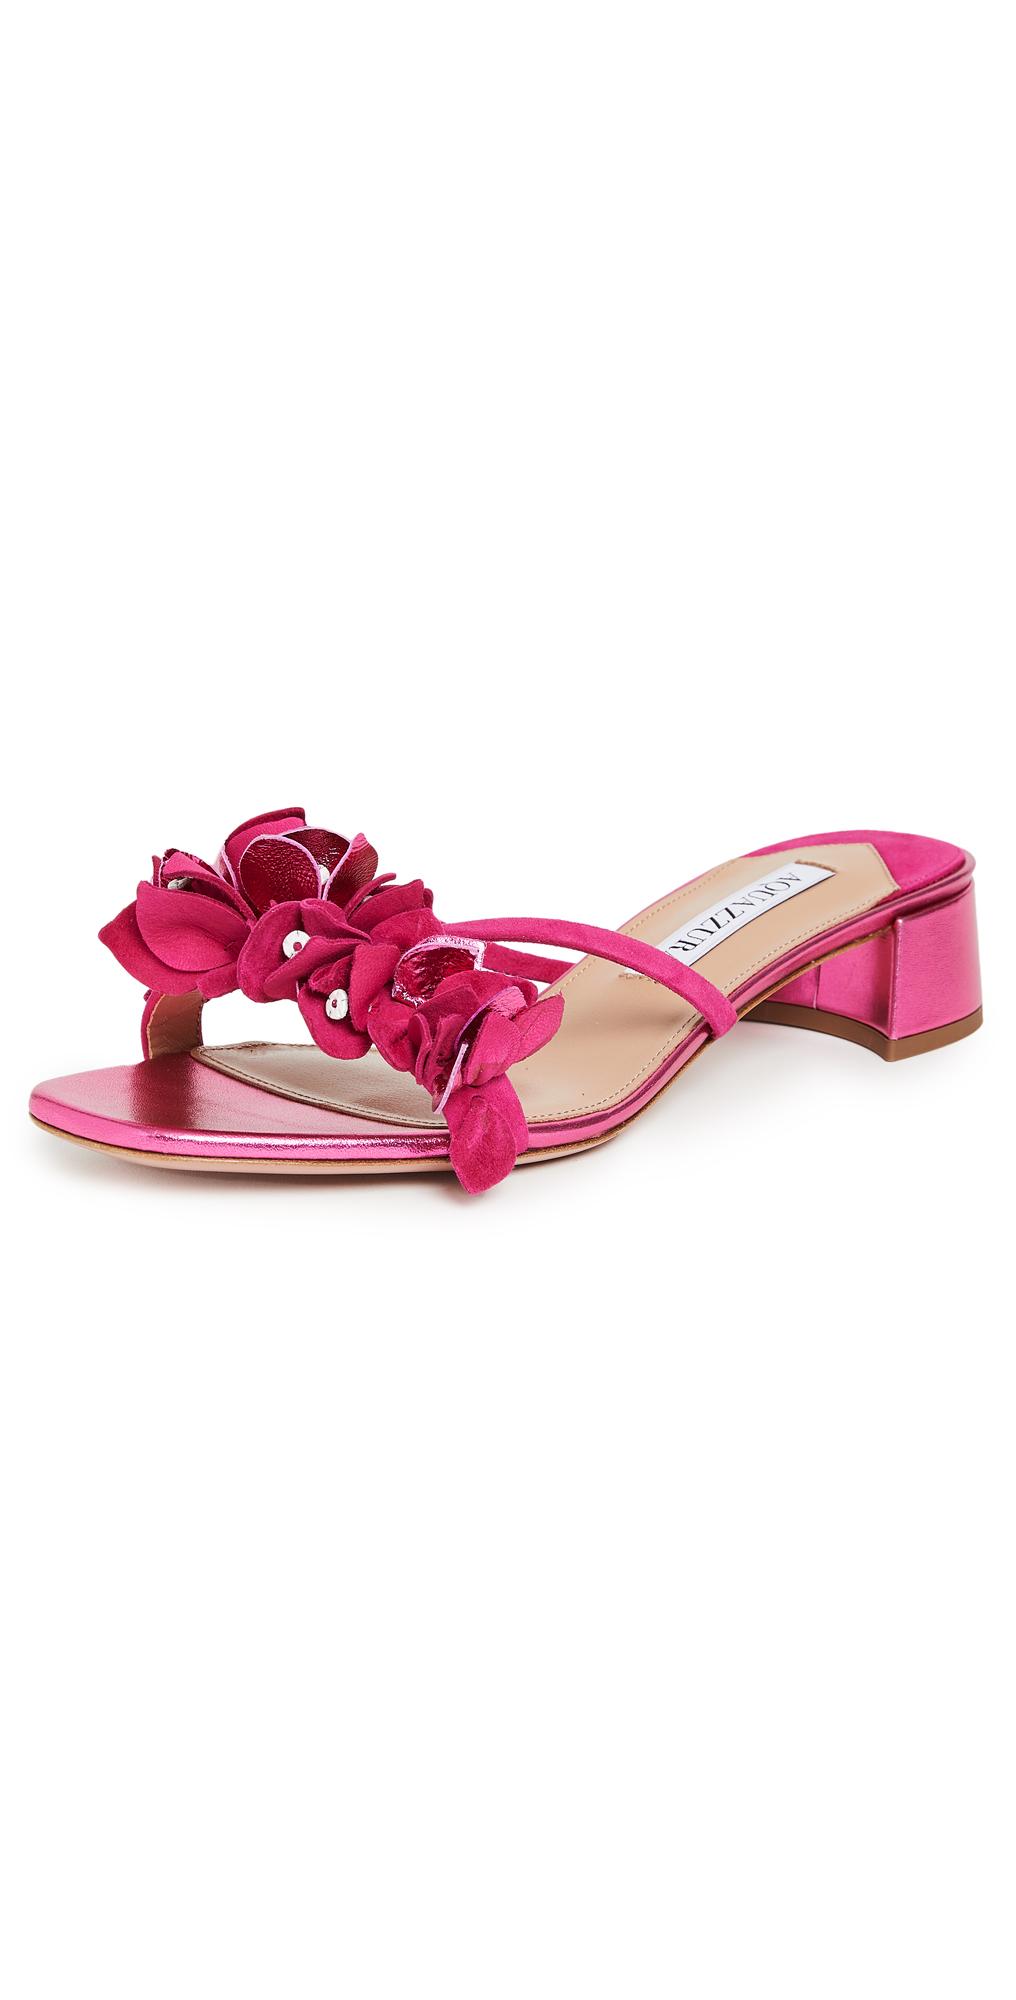 Aquazzura Bougainvillea 30mm Slide Sandals